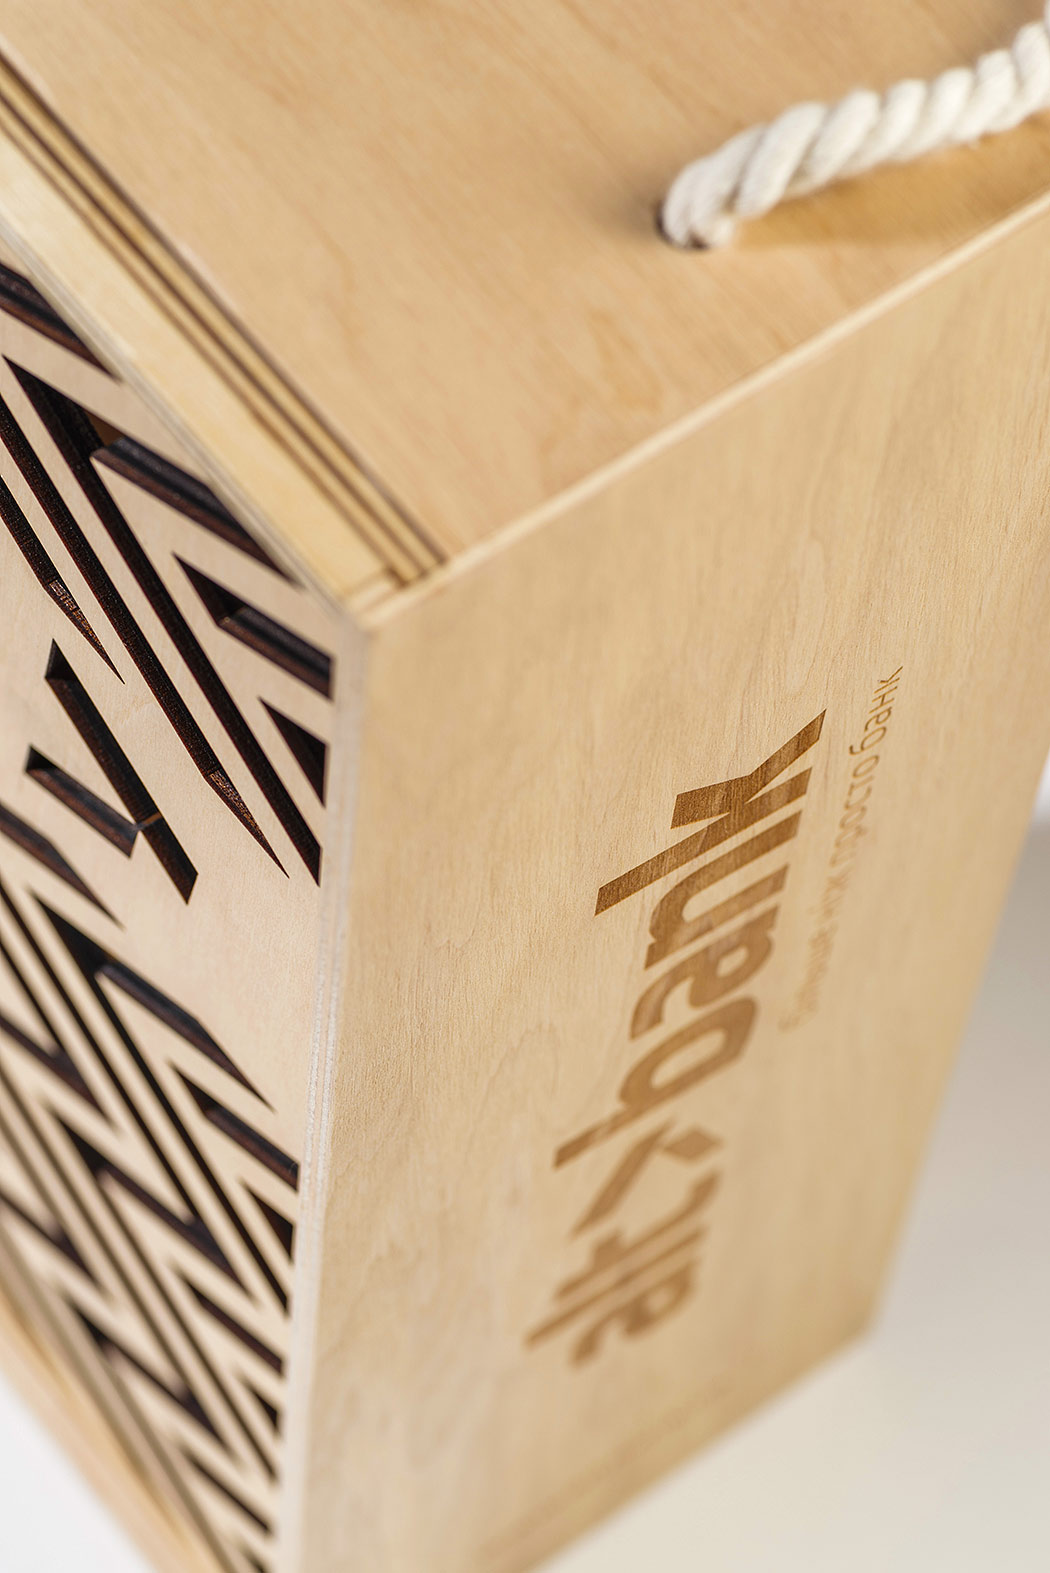 Фанерна коробка (ящик) для вина з логотипом банку Altbank (Альтбанк).